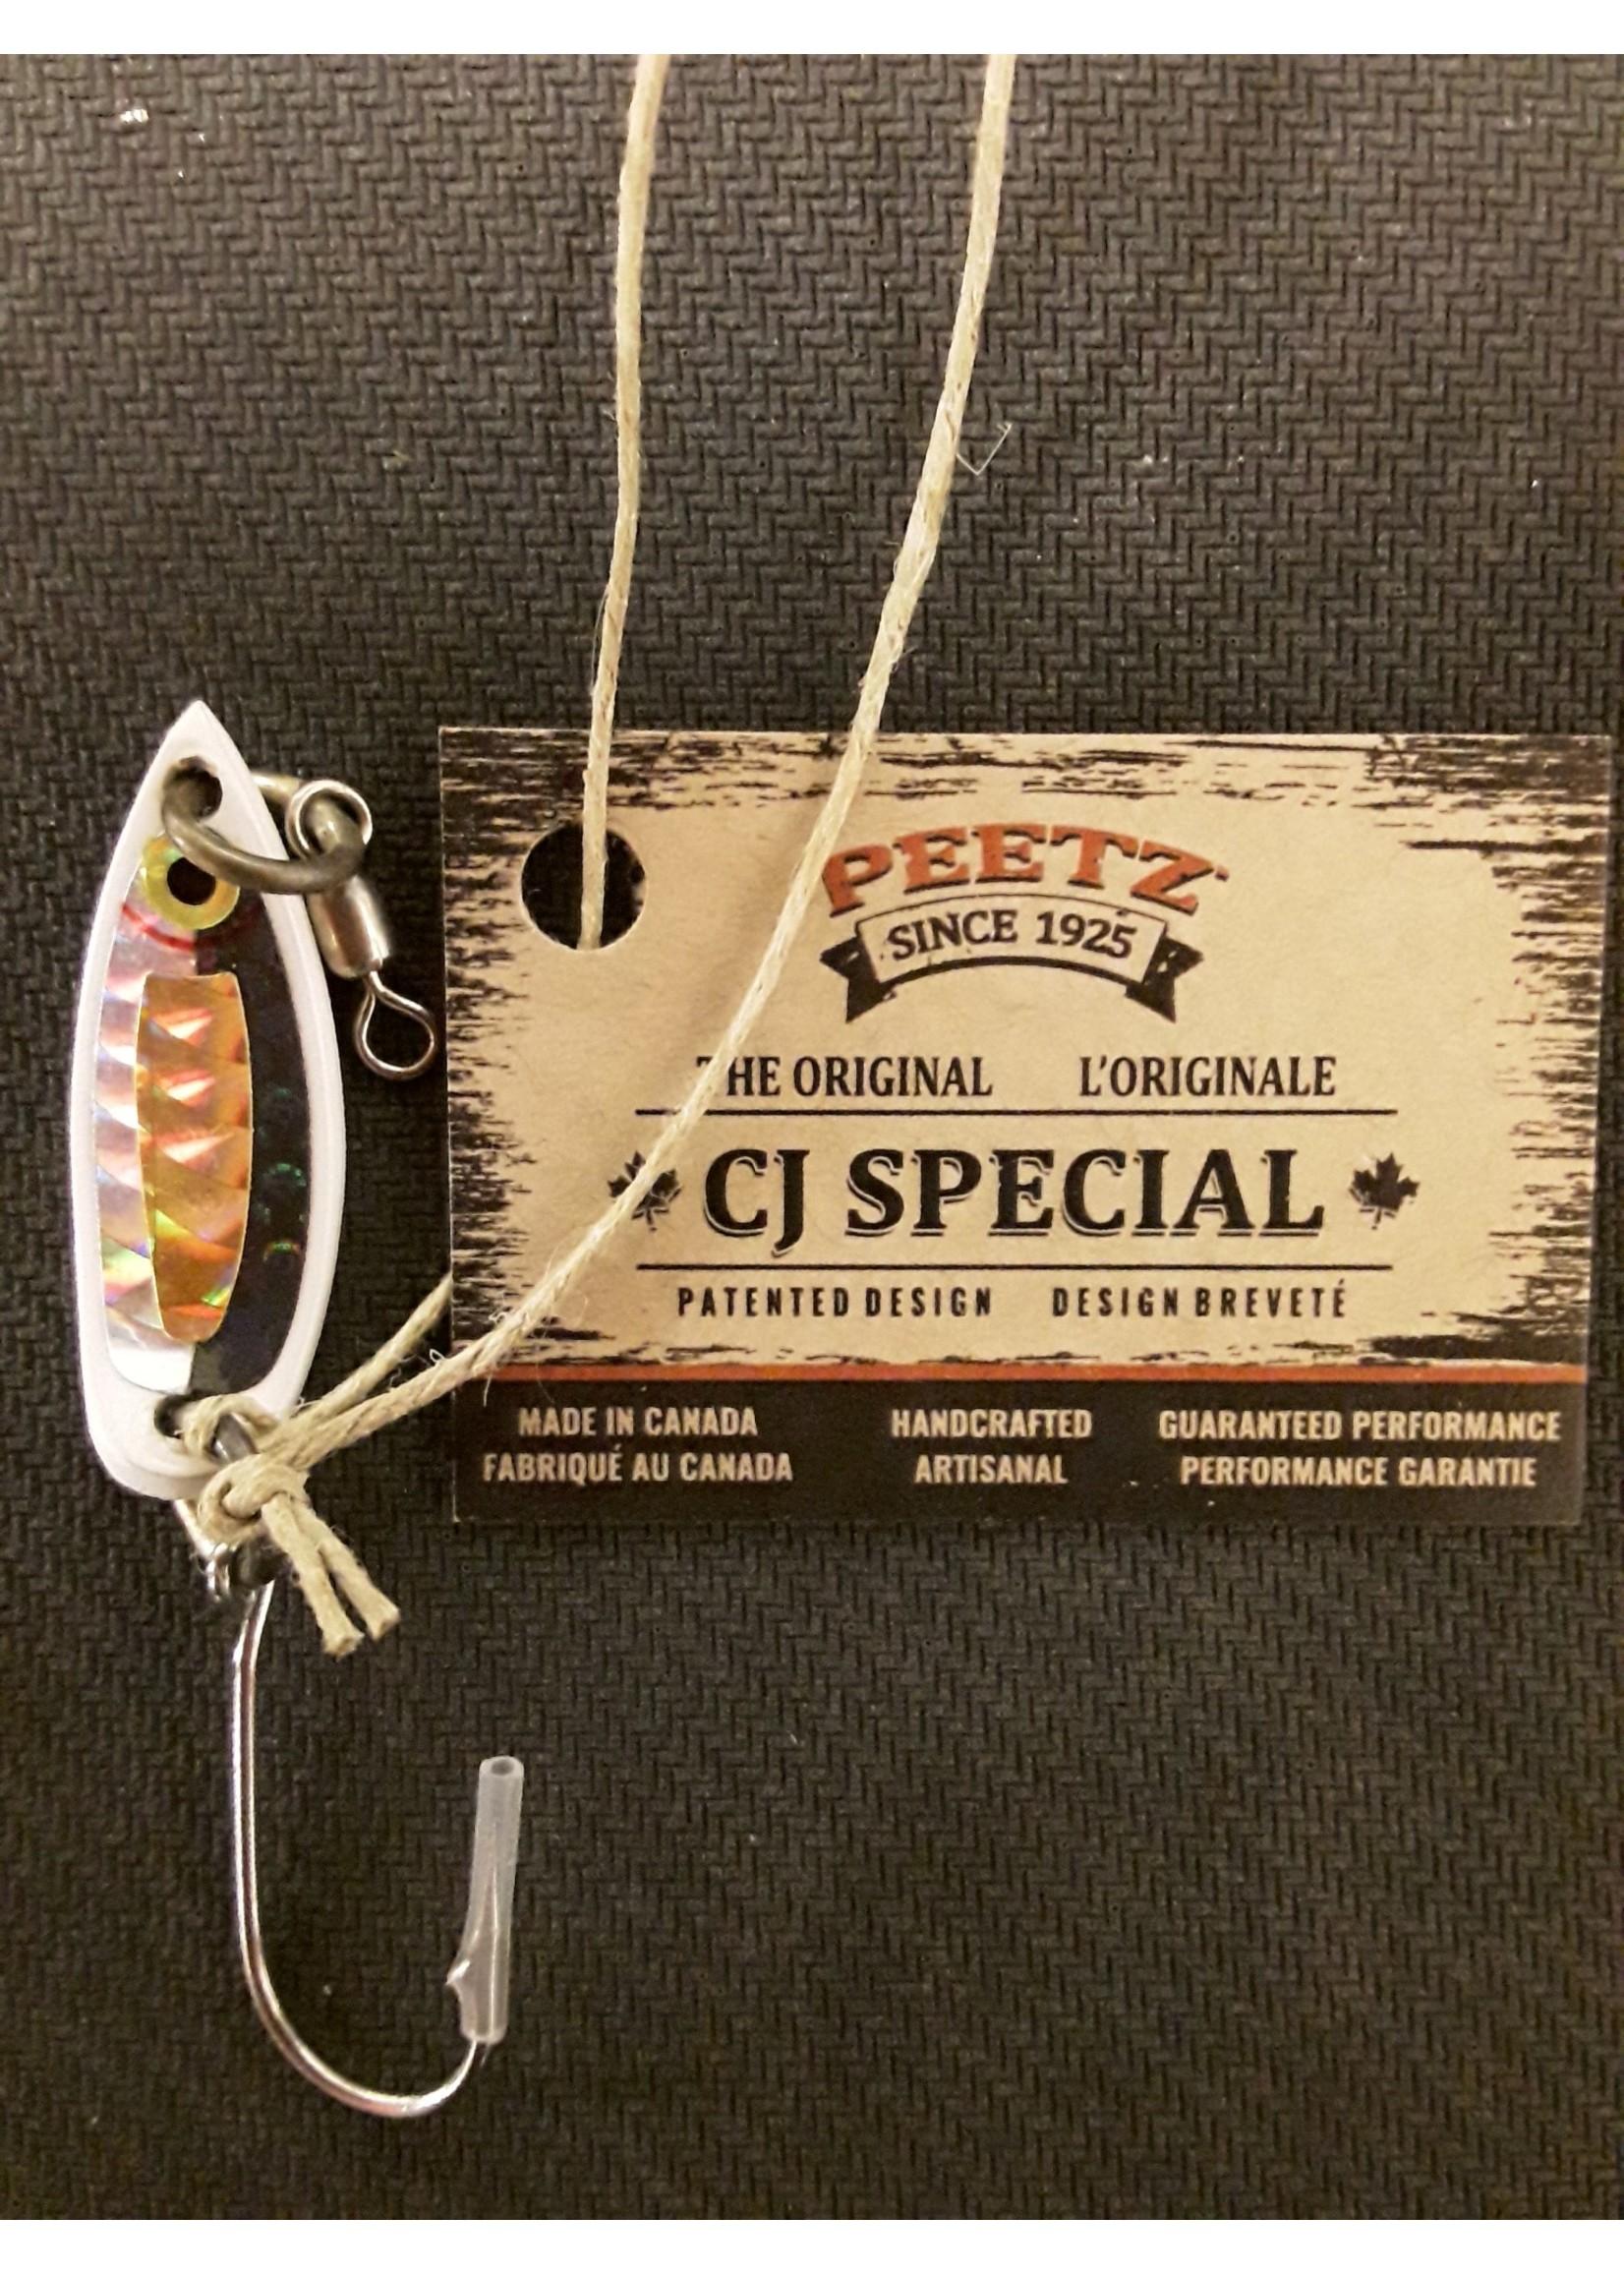 "Peetz Outdoor Unlimited Peetz CJ Special Herring Blk Top Sil/Gold Scale 1.5"""